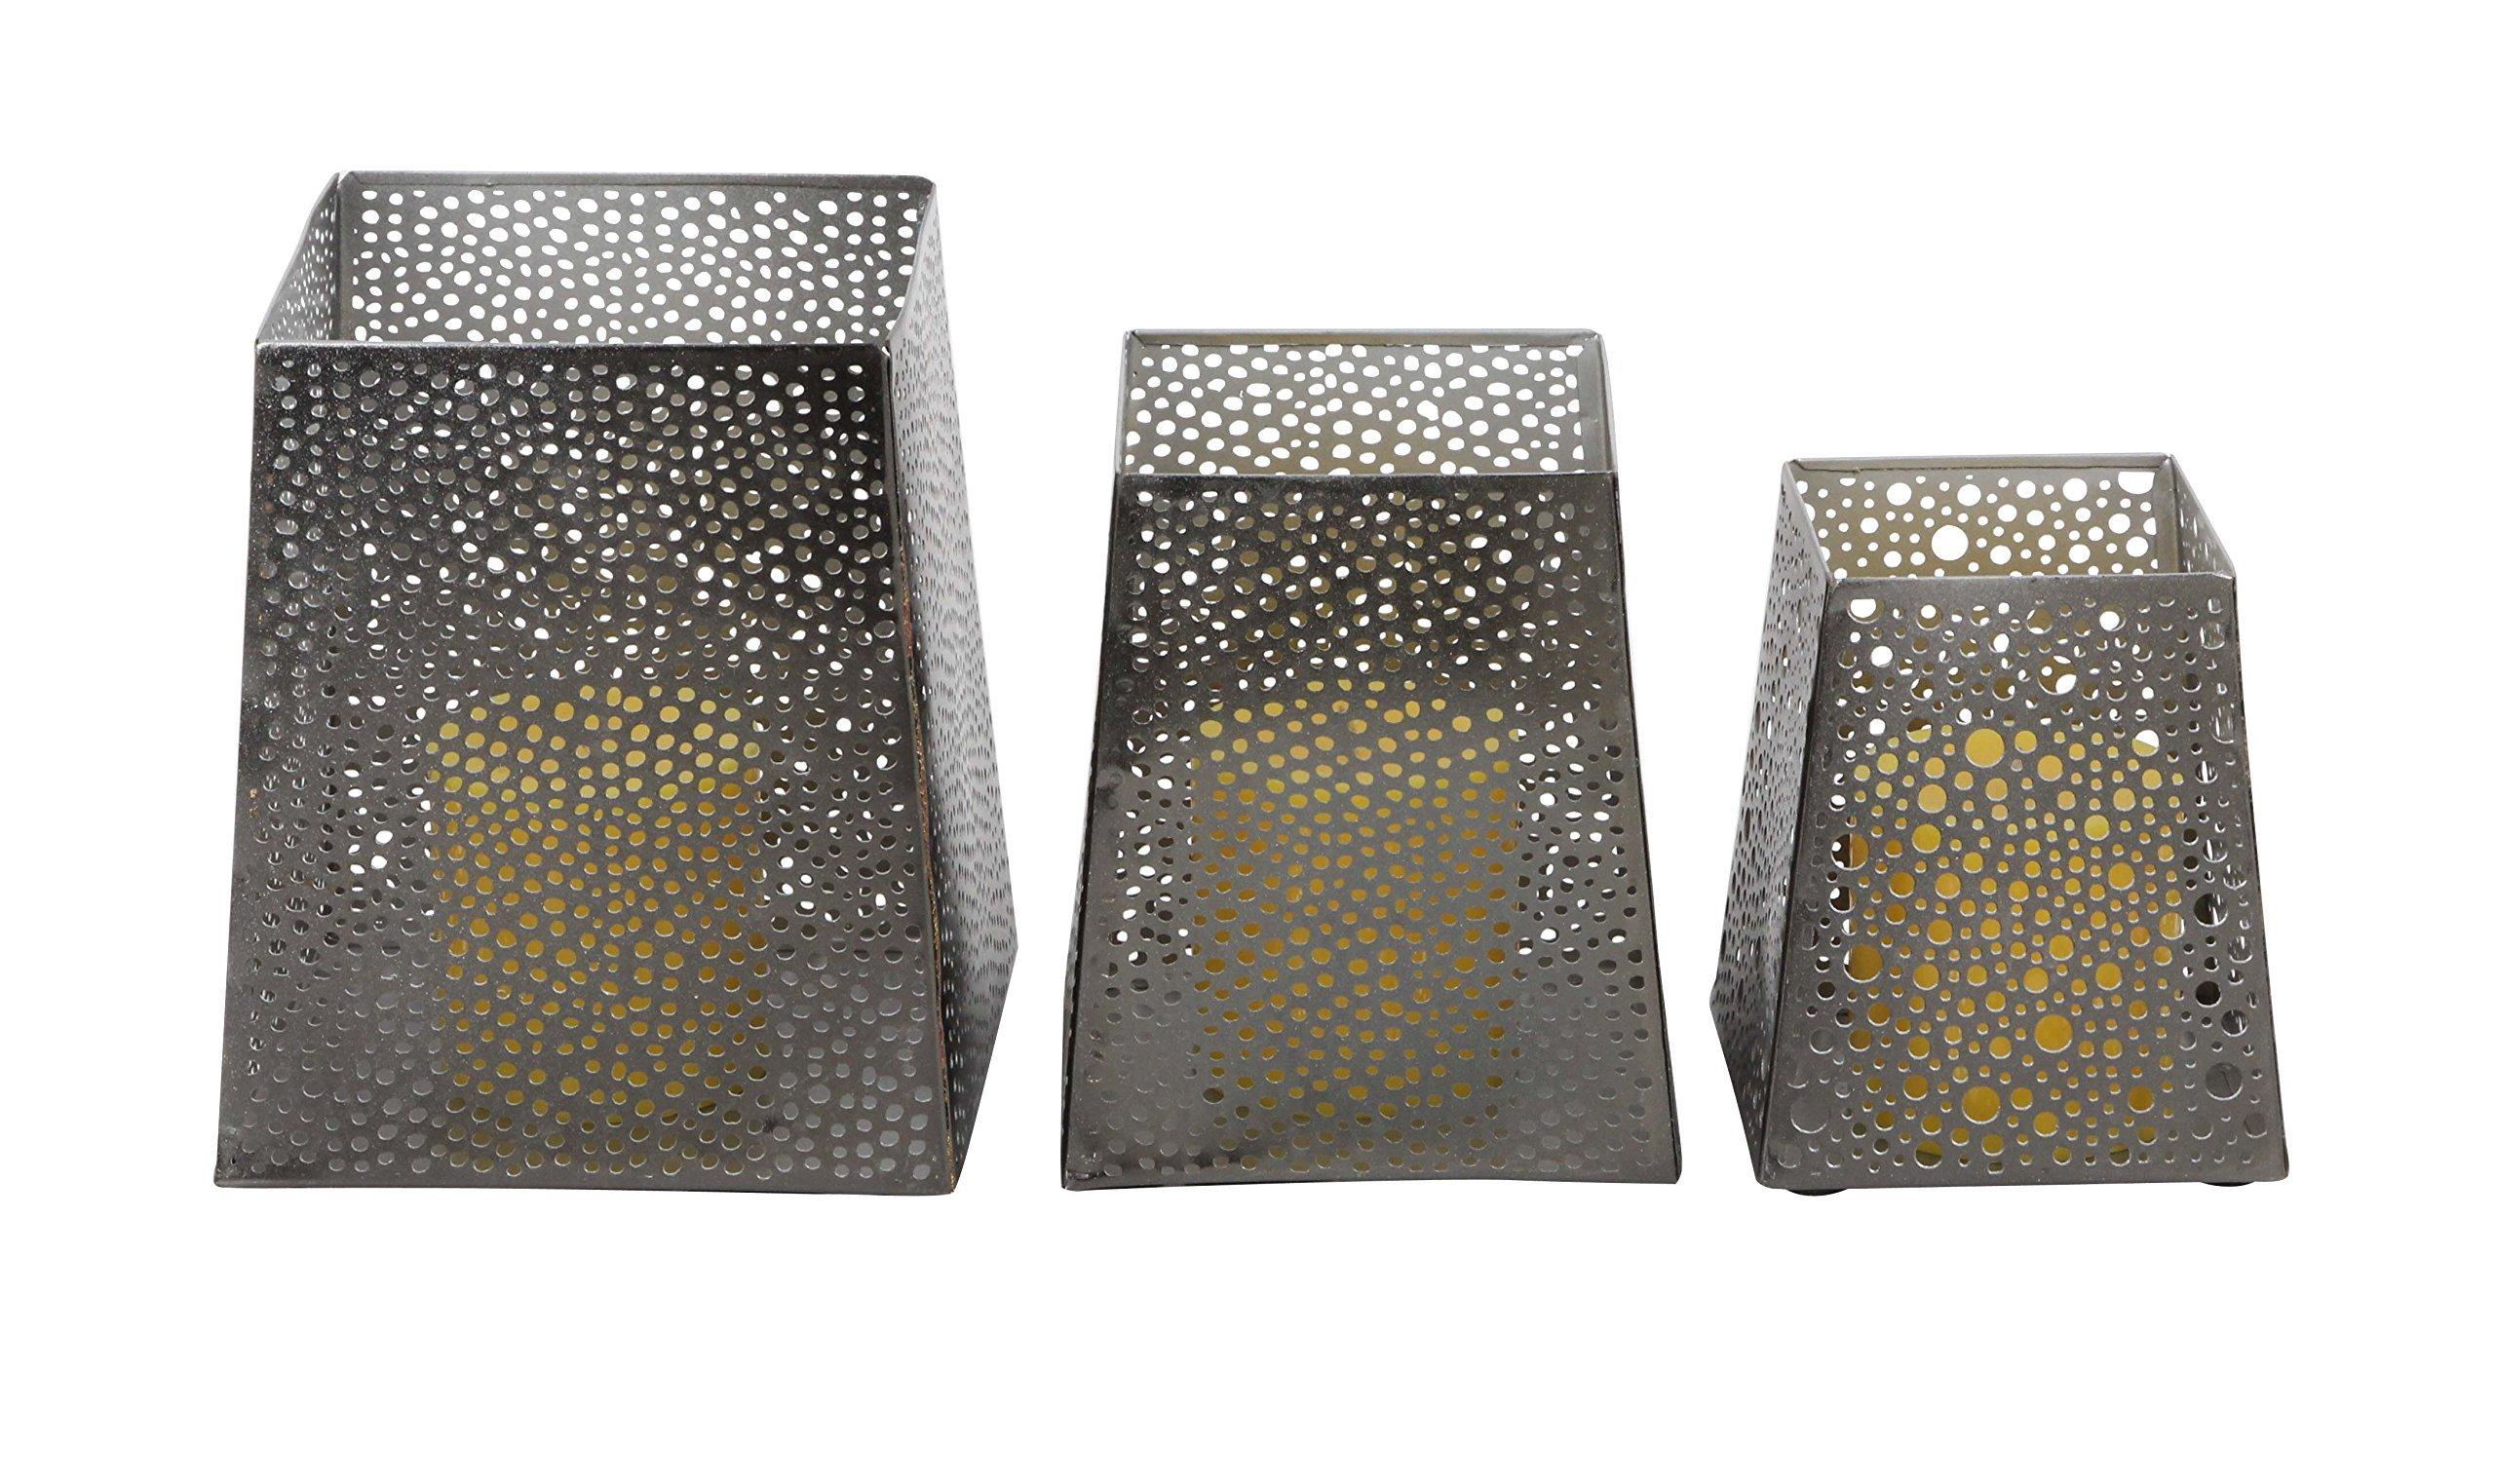 Deco 79 57347 Matte Iron Trapezoidal Candle Holders (Set of 3), 5'' x 6'' x 7'', Gray